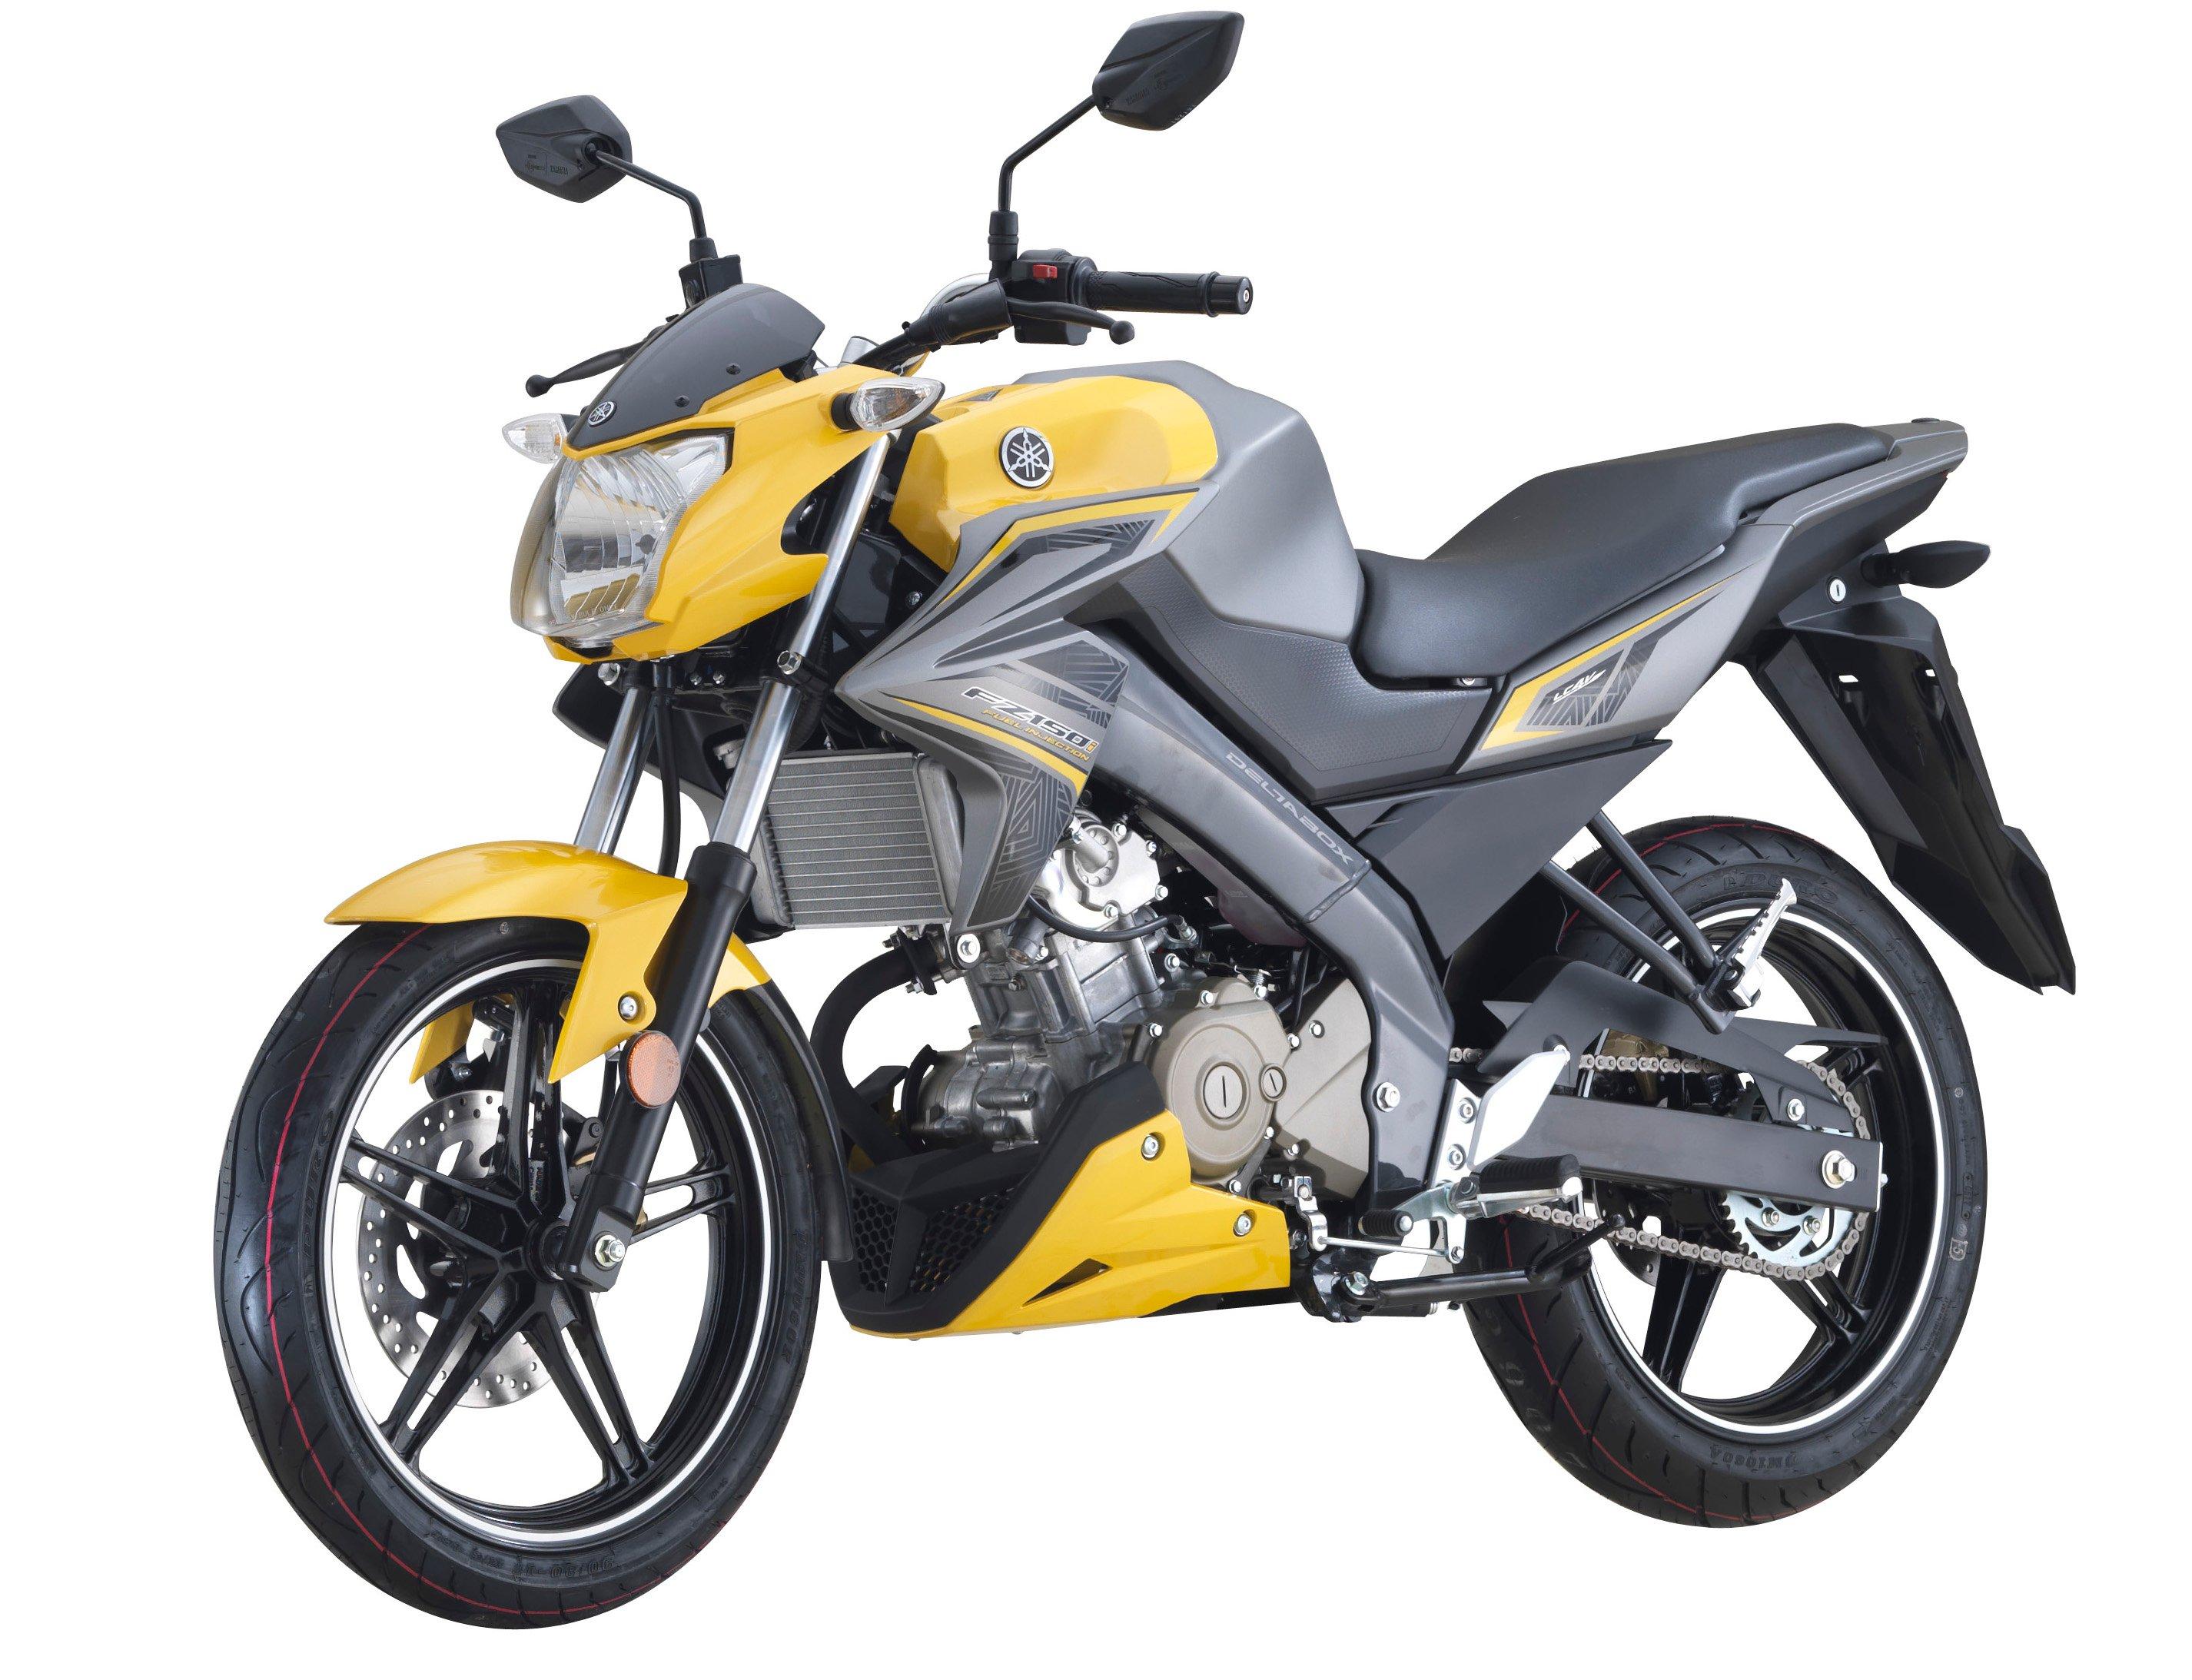 Yamaha fz 150 price